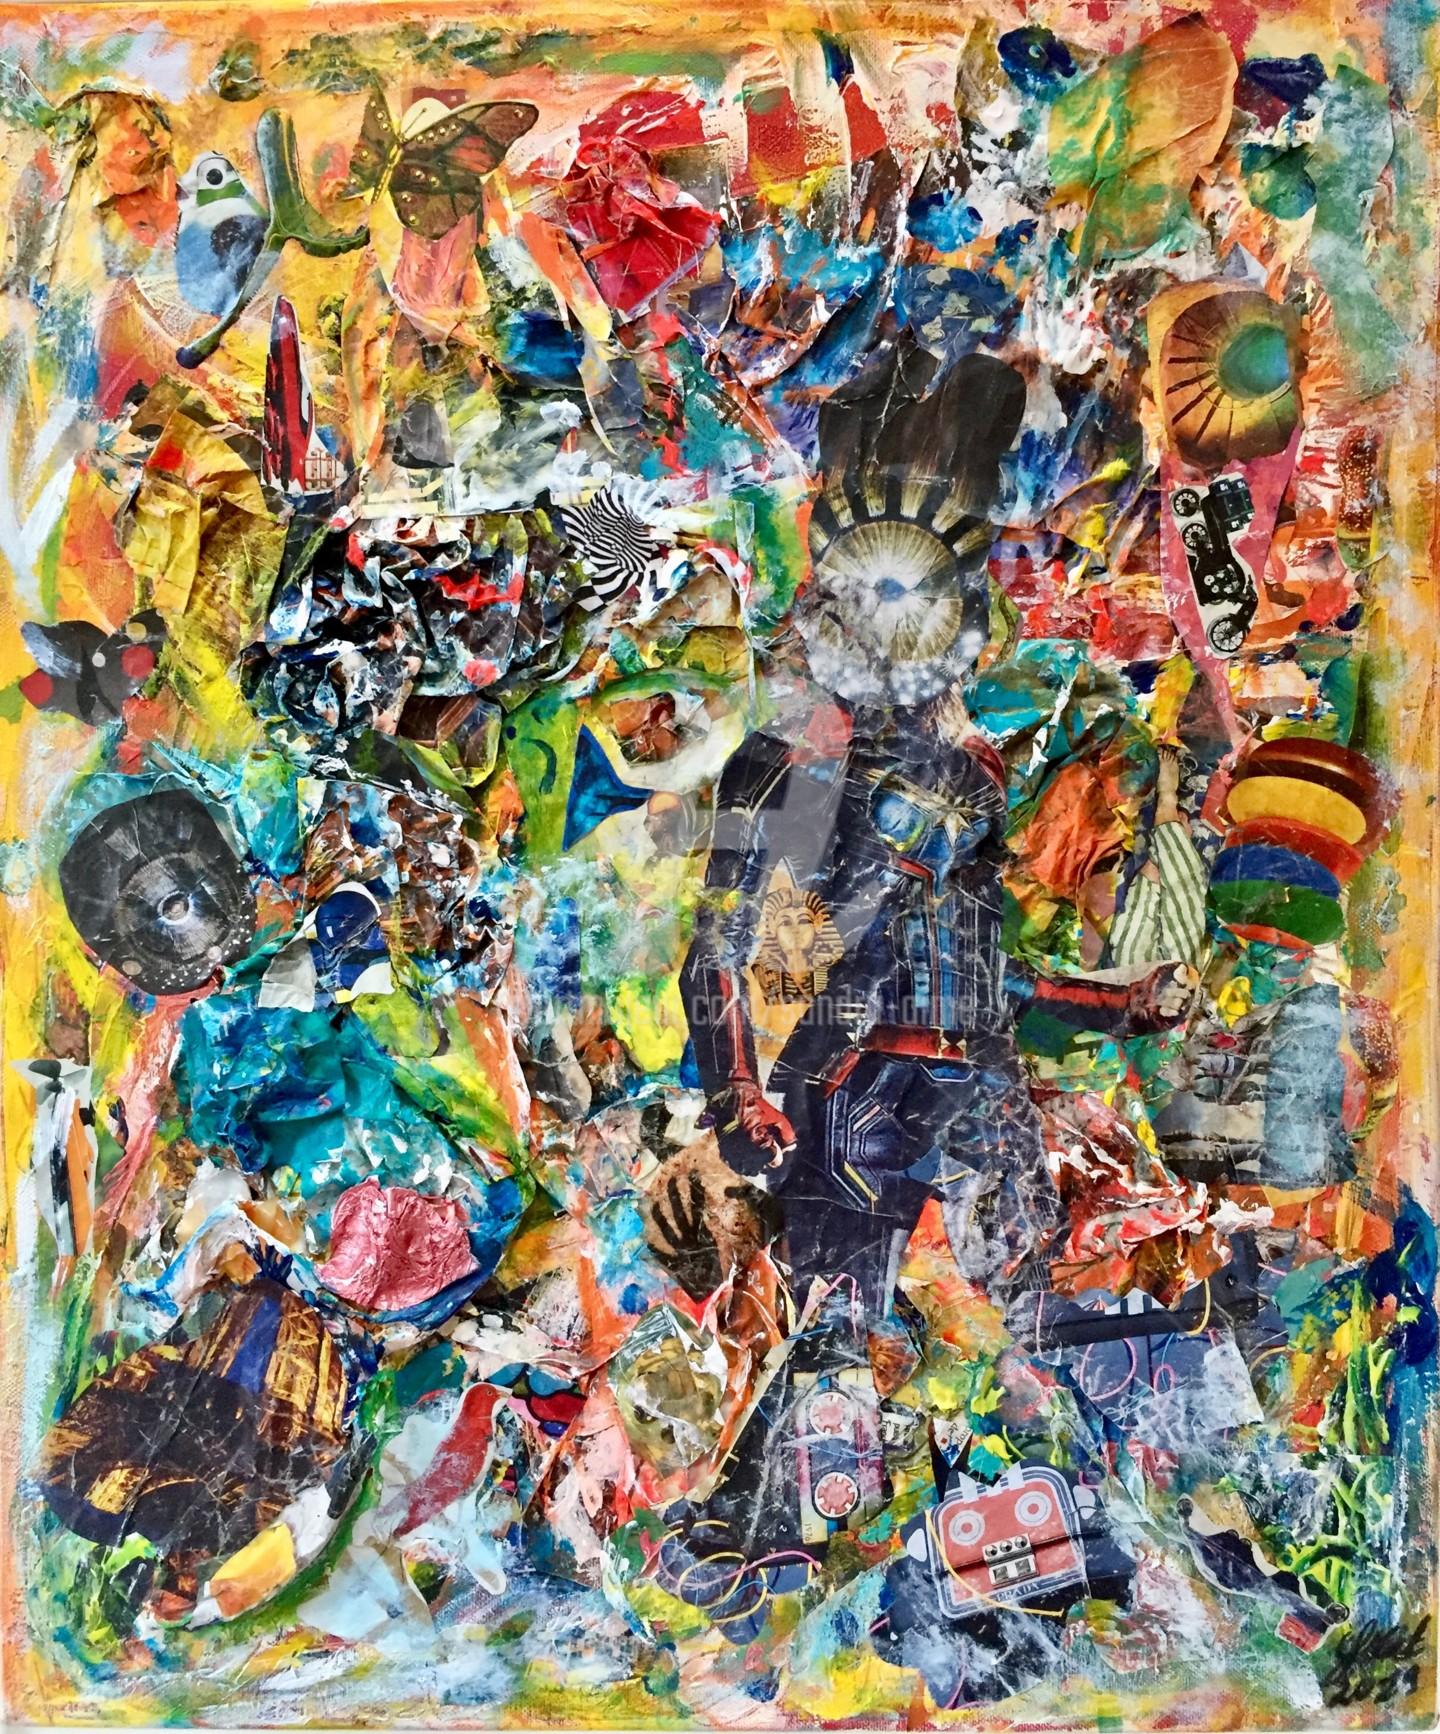 Sandra Aime - «Le sens de la métamorphose»